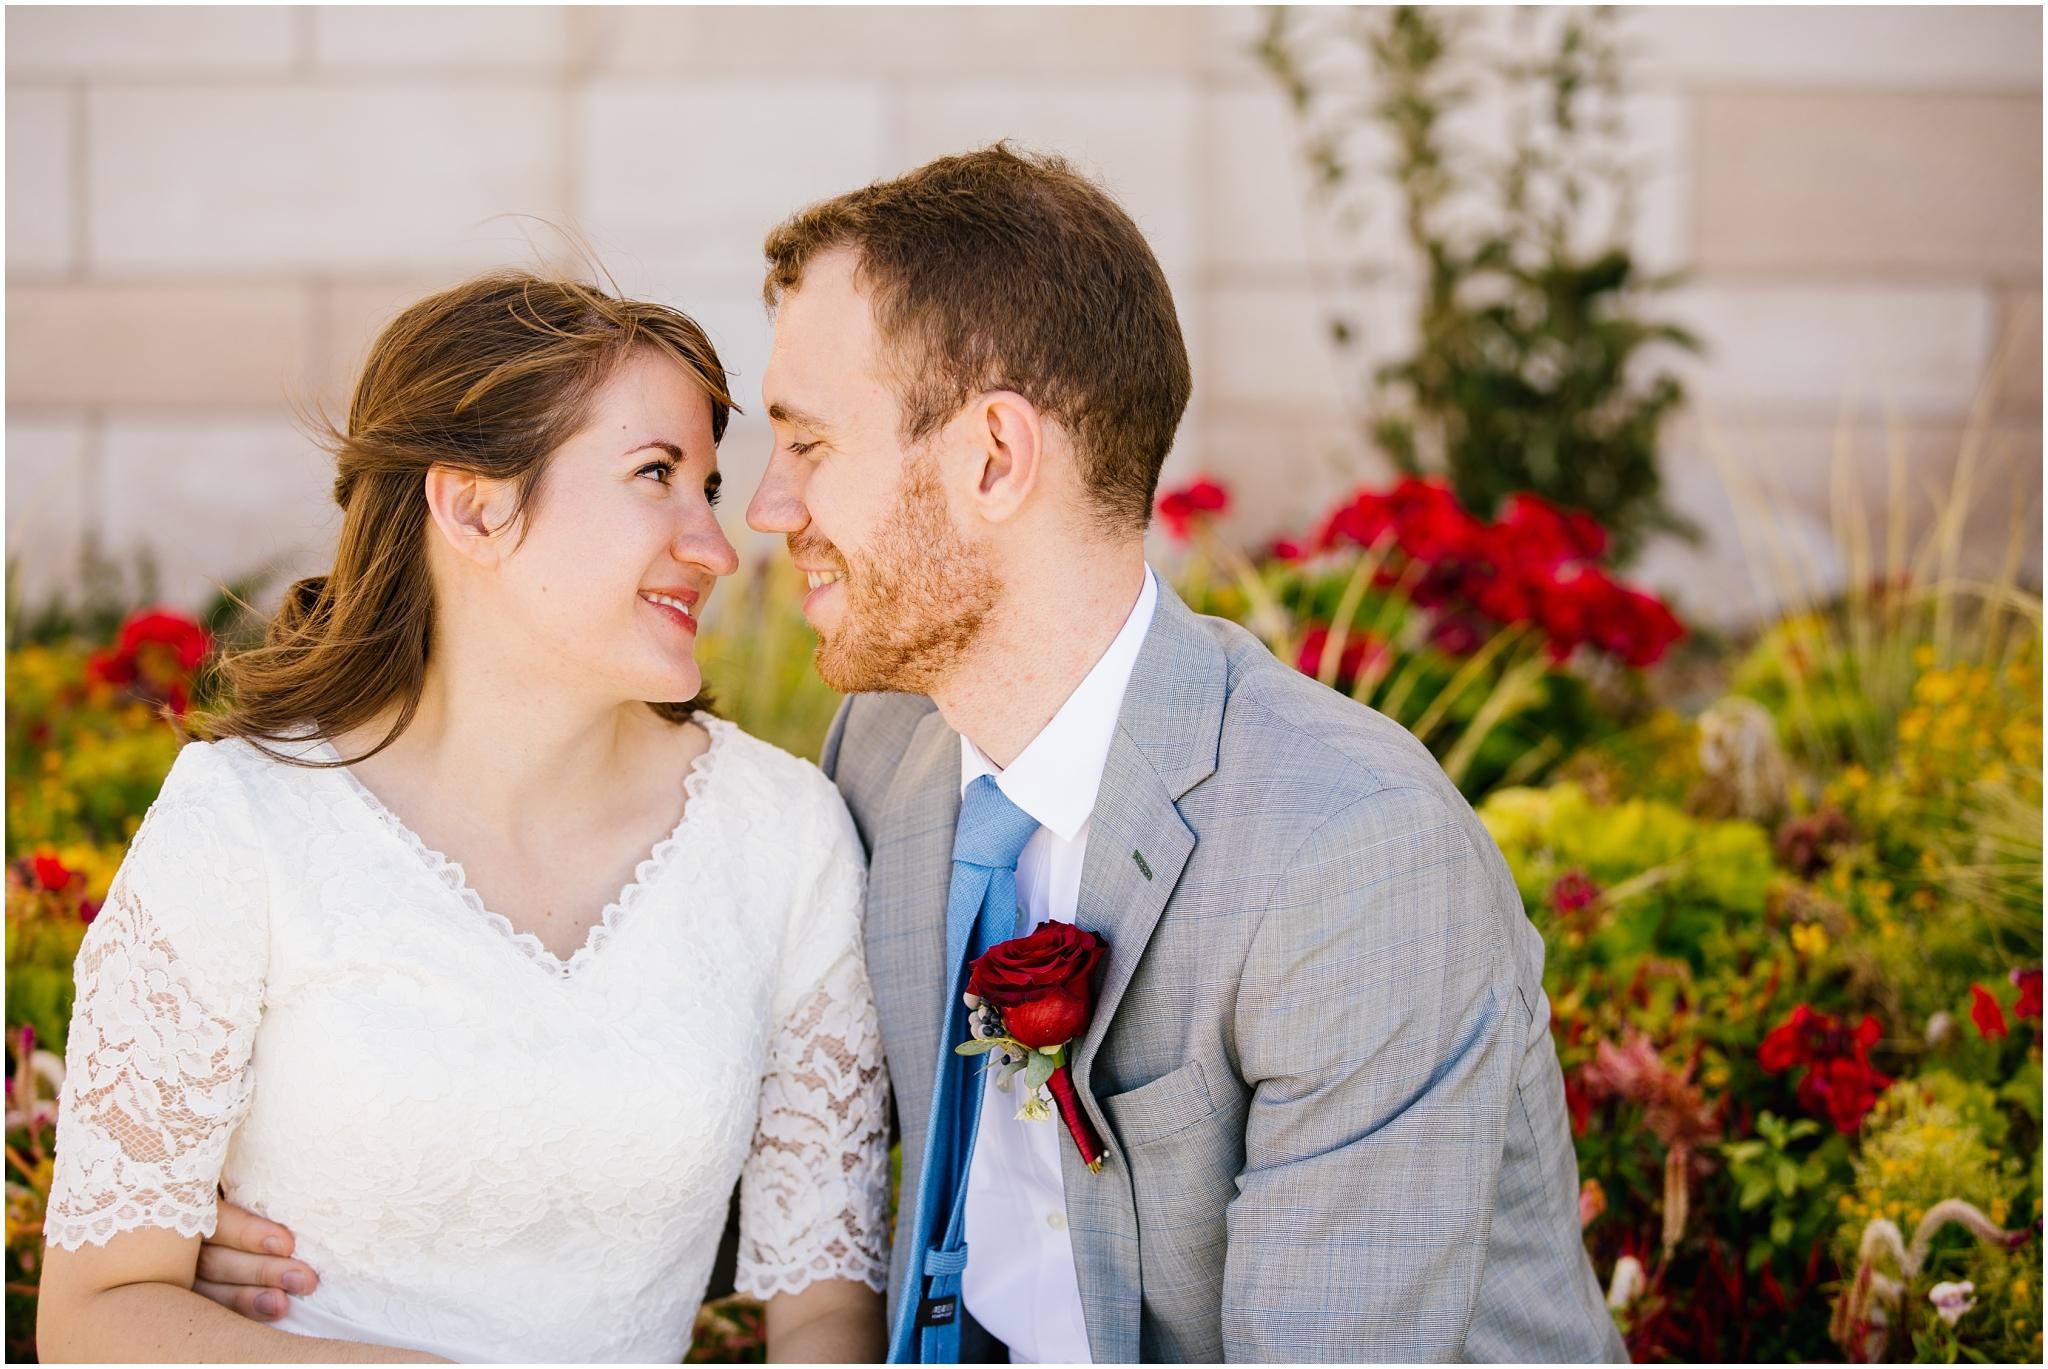 BrynneWinston-166_Lizzie-B-Imagery-Utah-Wedding-Photographer-Utah-County-Manti-Temple.jpg